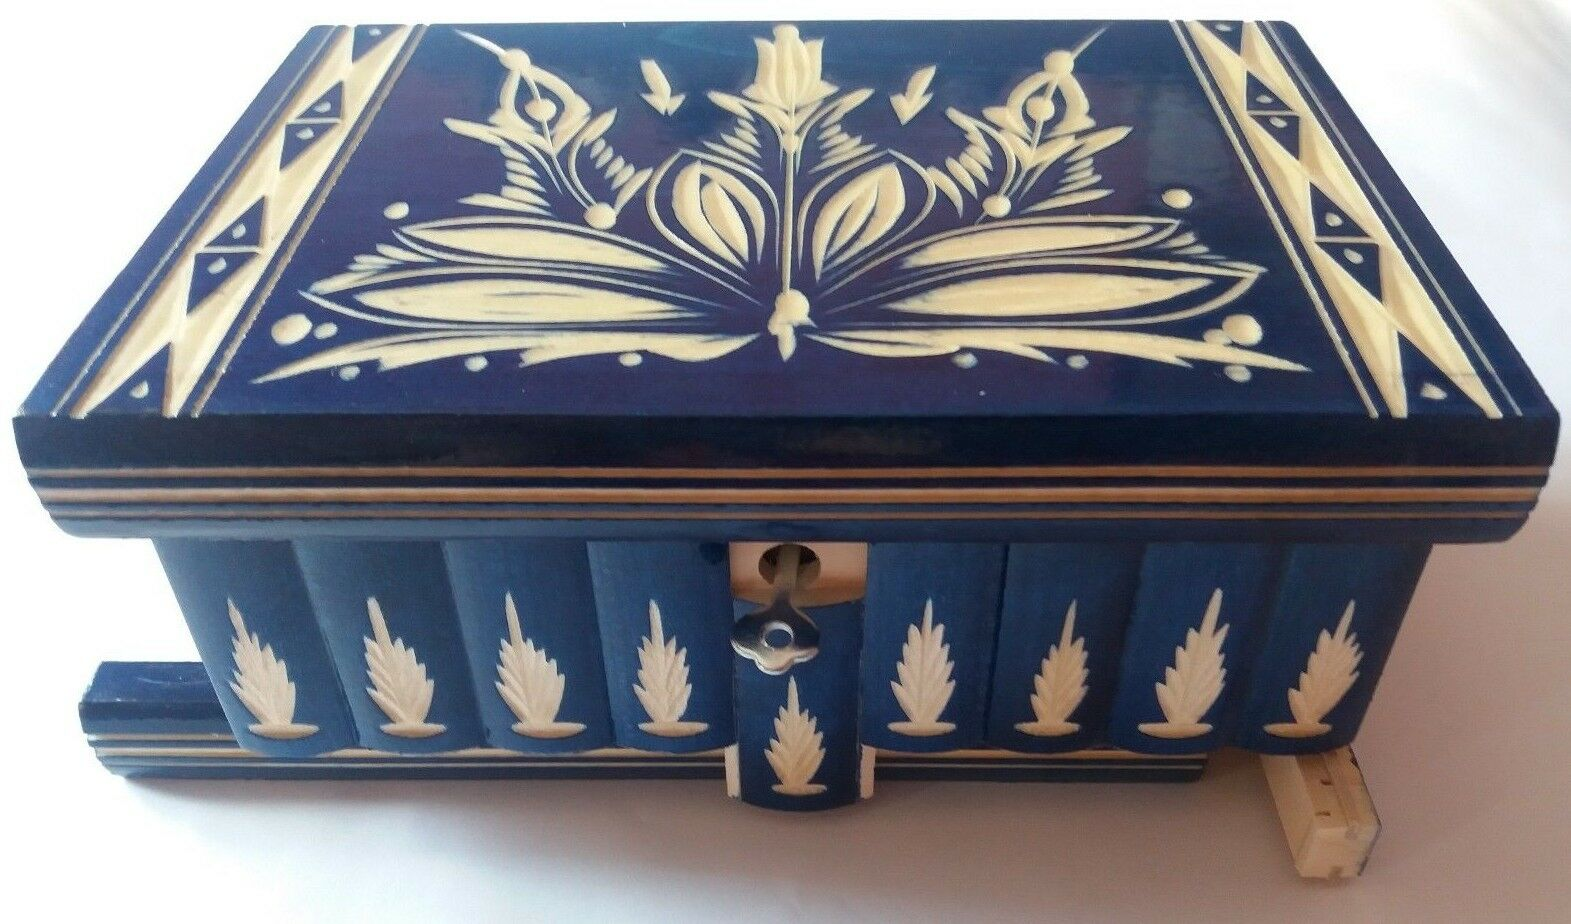 New big huge blu jewelry magic puzzle box adventure challenge hidden drawer toy